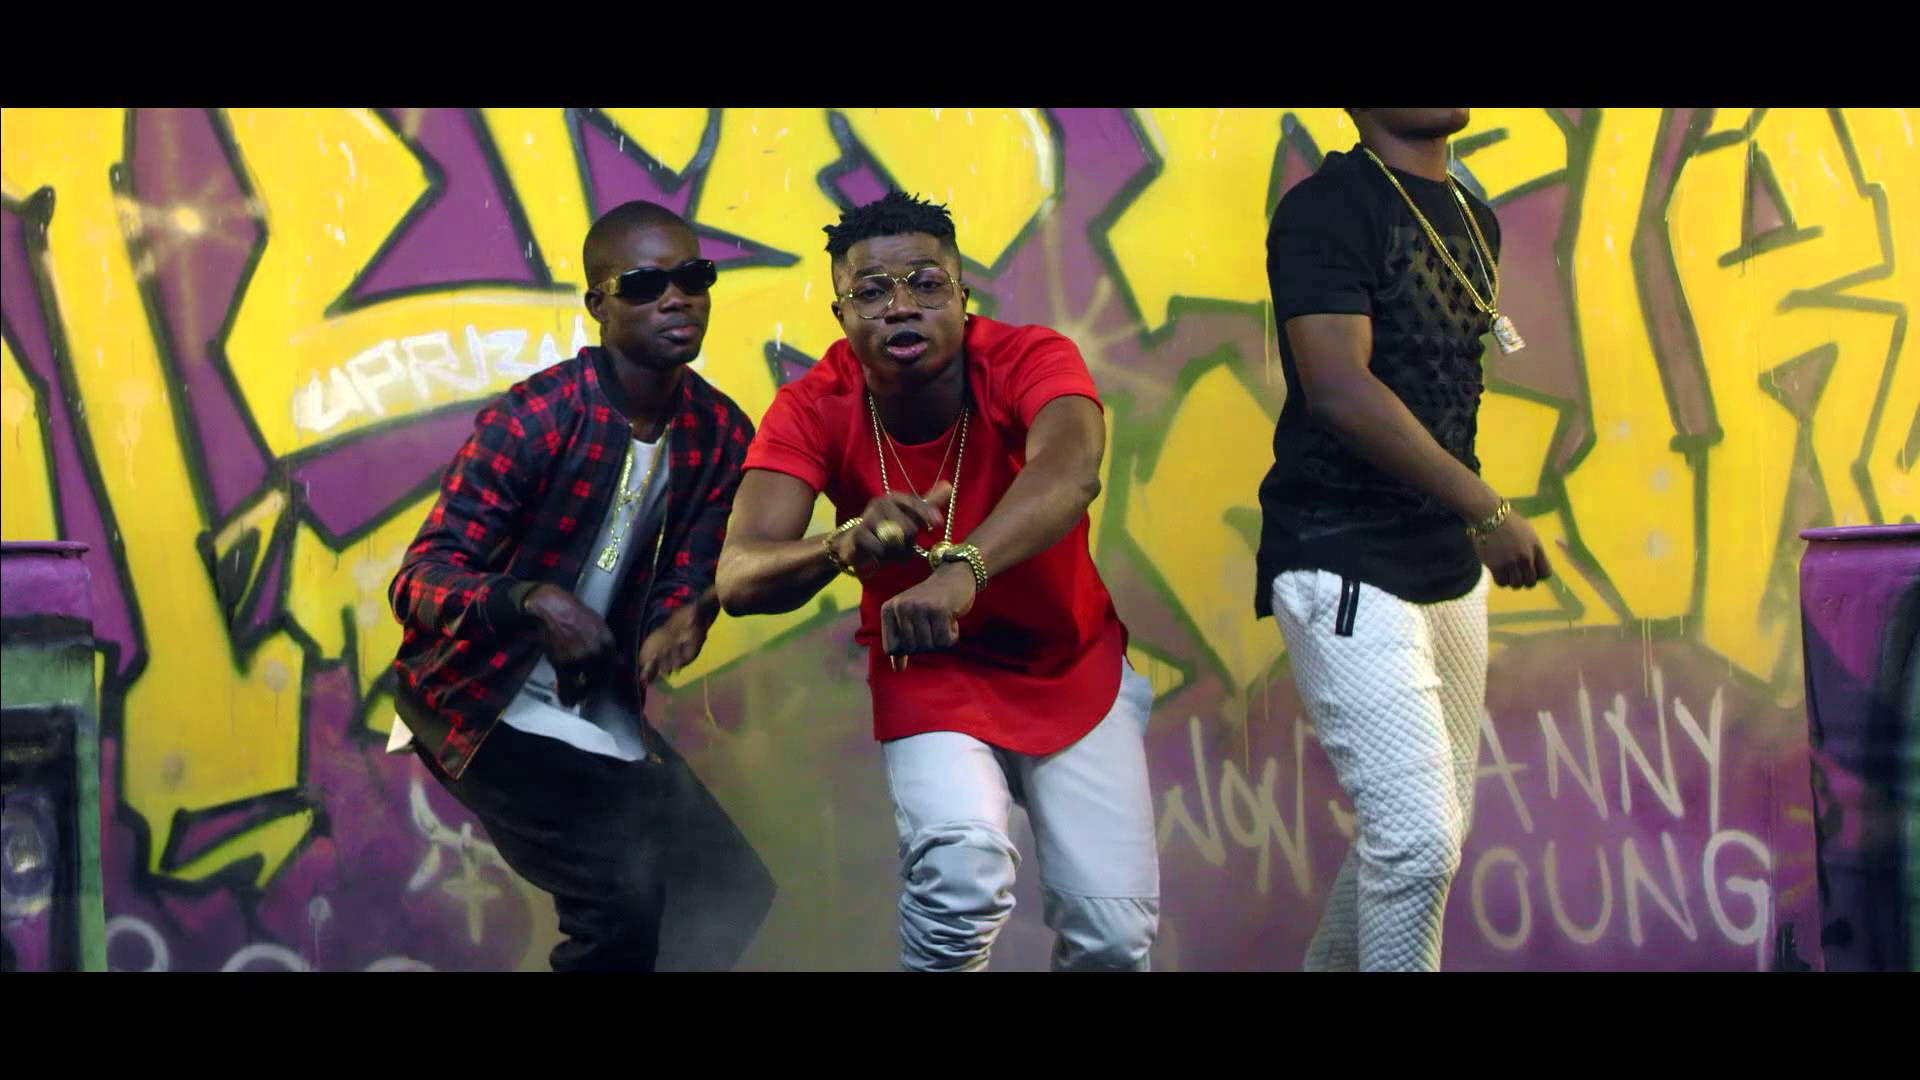 Download Video: Dj Phobia – Aiye Street ft  Jaywon, Danny Young & Ben 7 |  @djphobia11